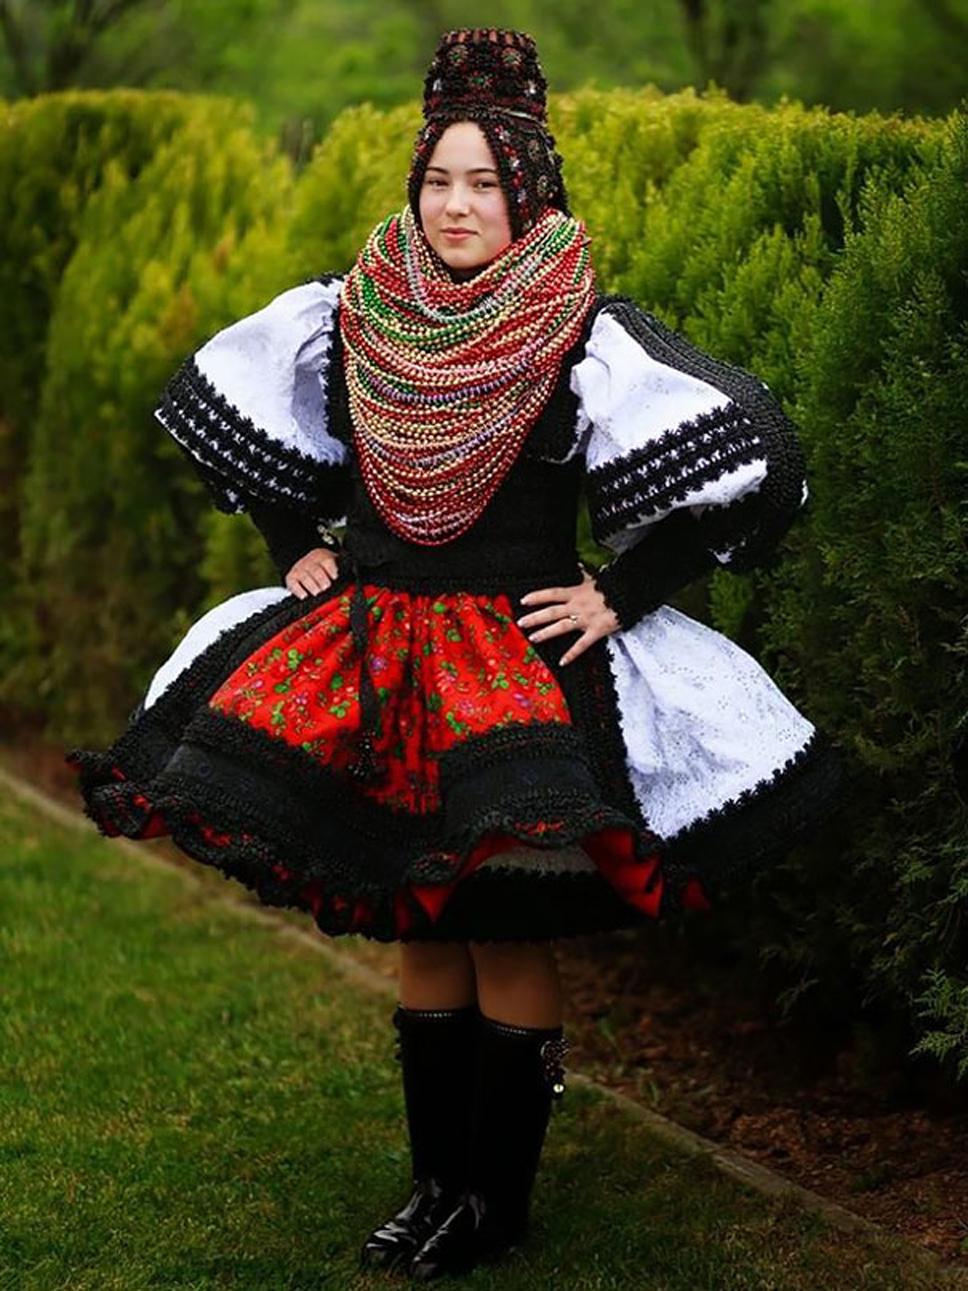 traditional-weddings-around-the-world-21__605